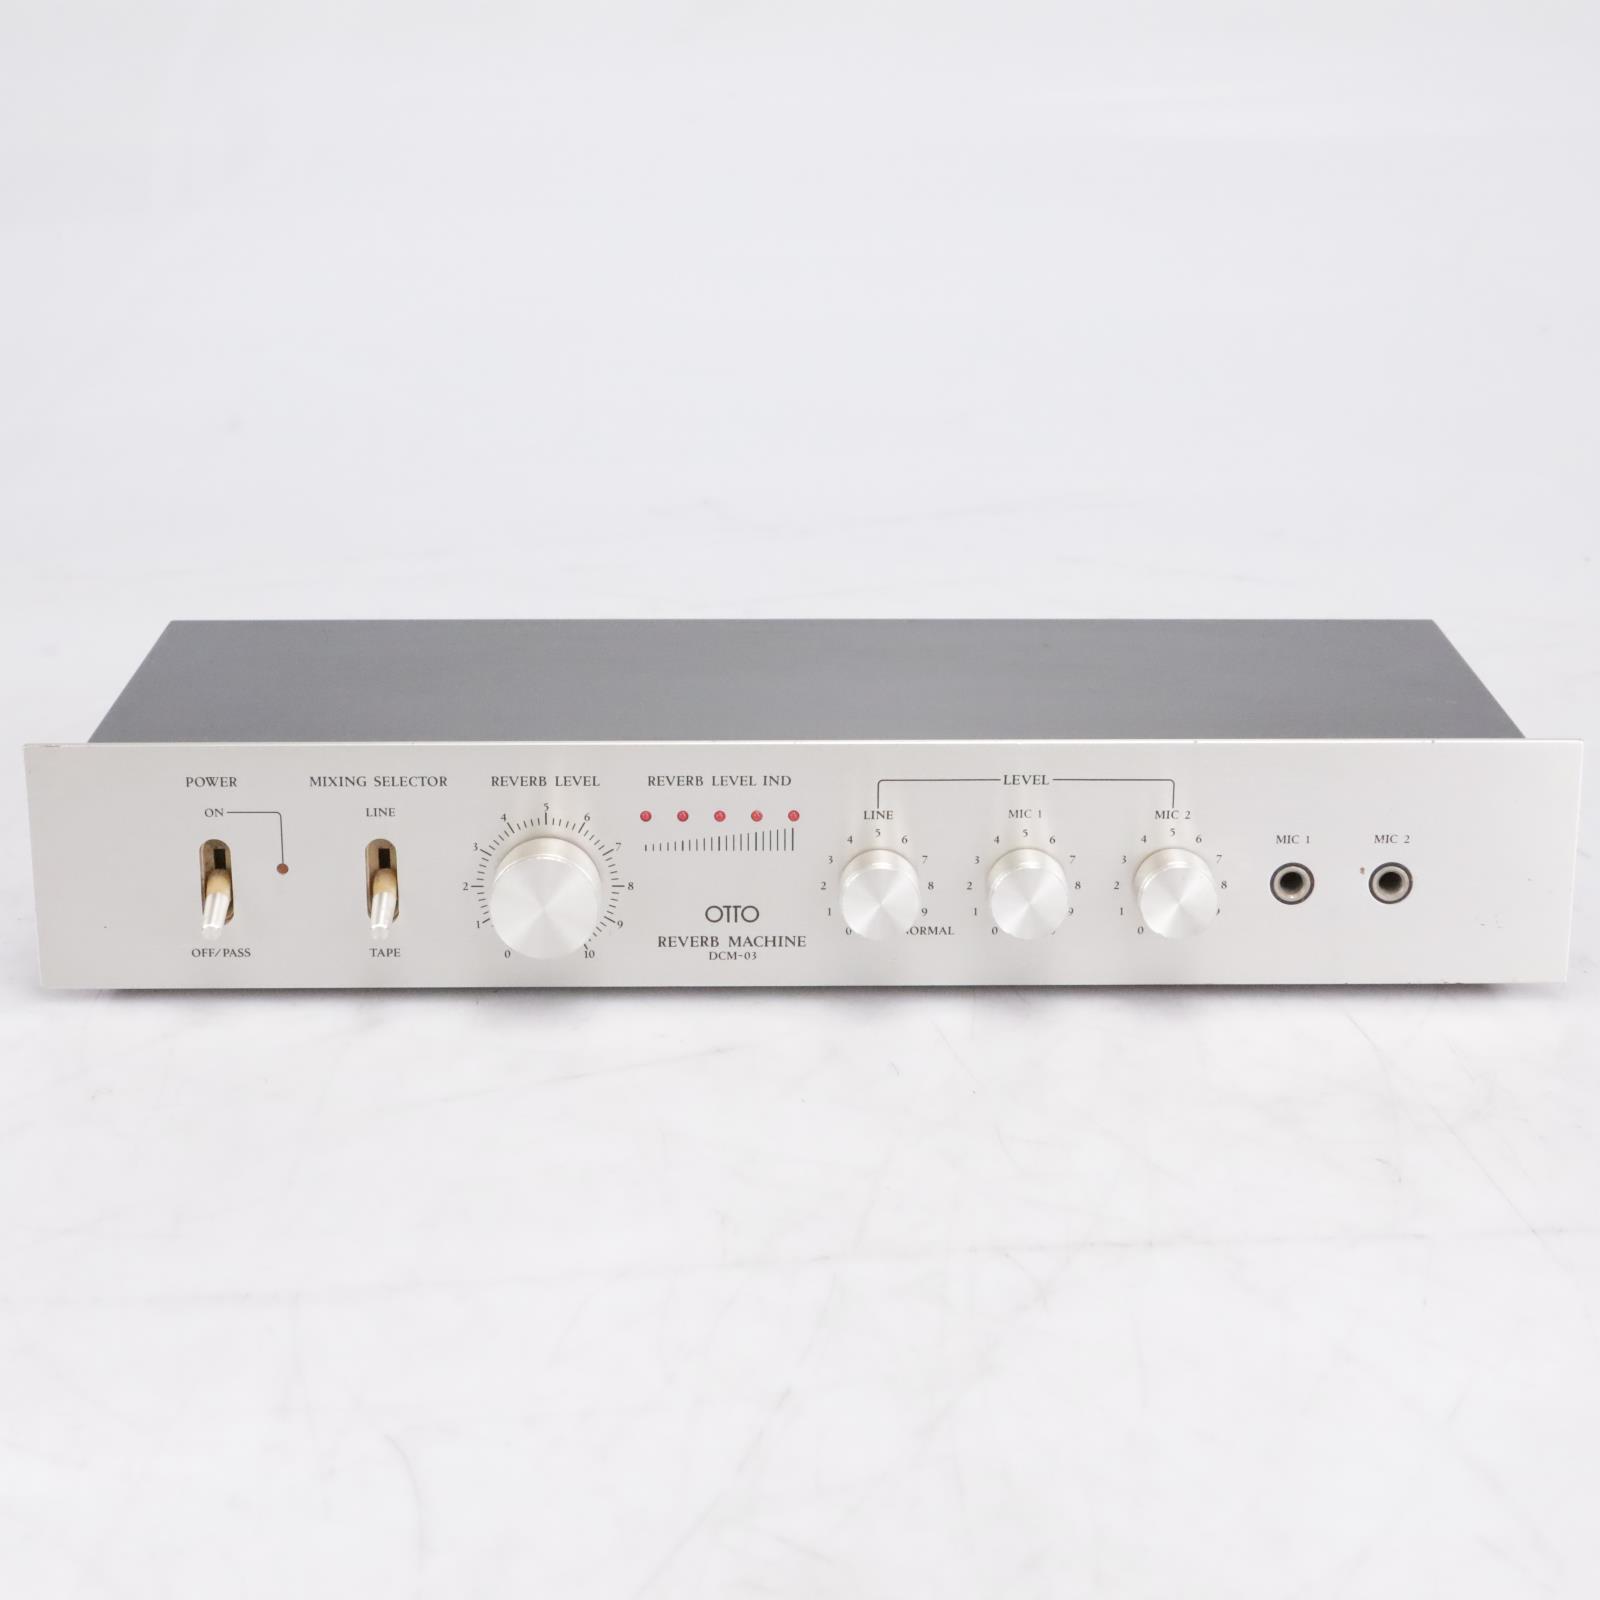 Sanyo Otto DCM-03 Reverb Machine 70s Karaoke System #42510